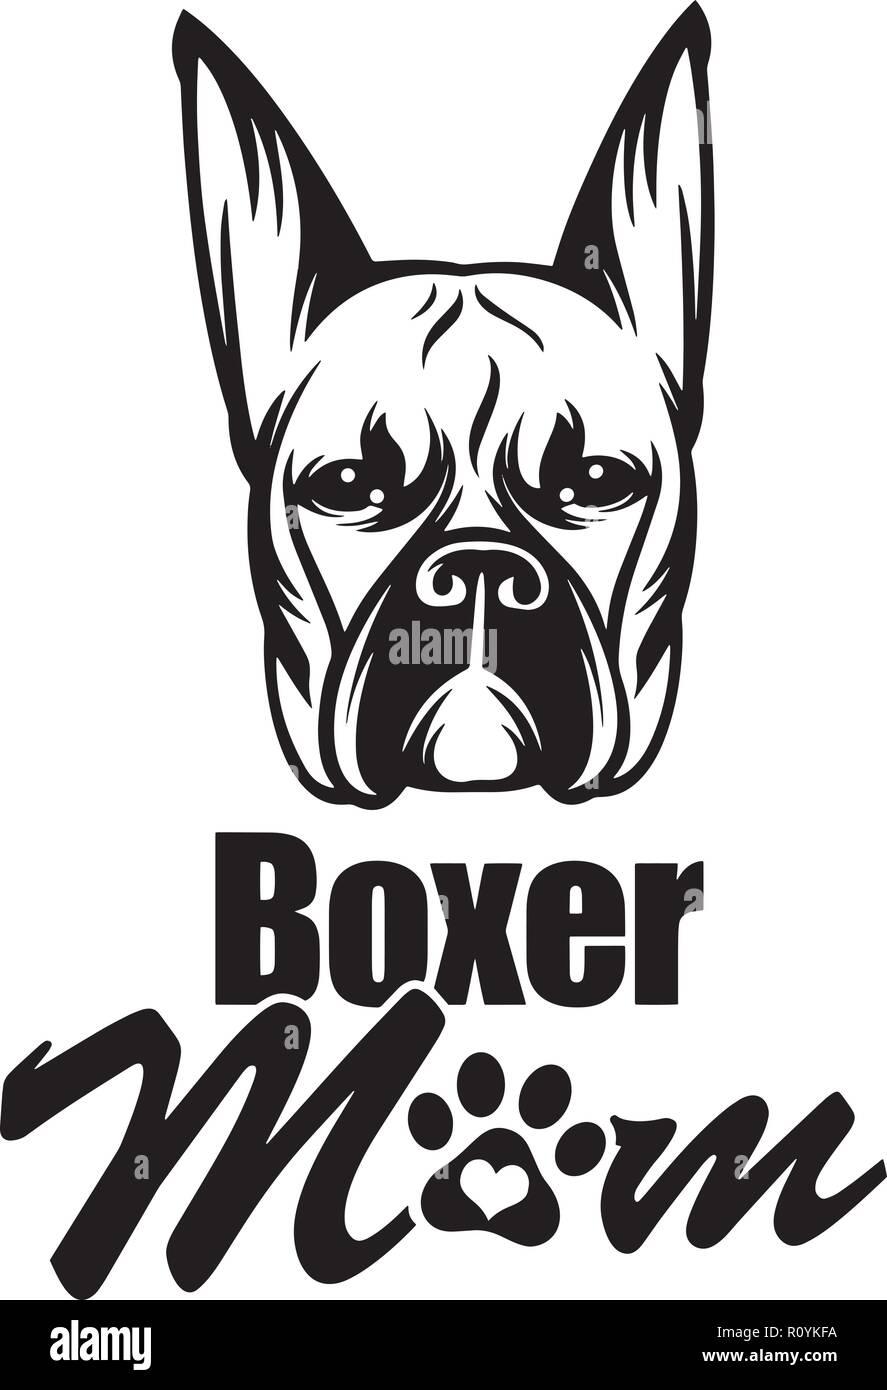 Boxer Dog Breed Head Isolated Pedigree Pet Portrait Smiling Happy Puppy Face Animal Cartoon Illustration Portrait Art Artwork Cute Design - Stock Image